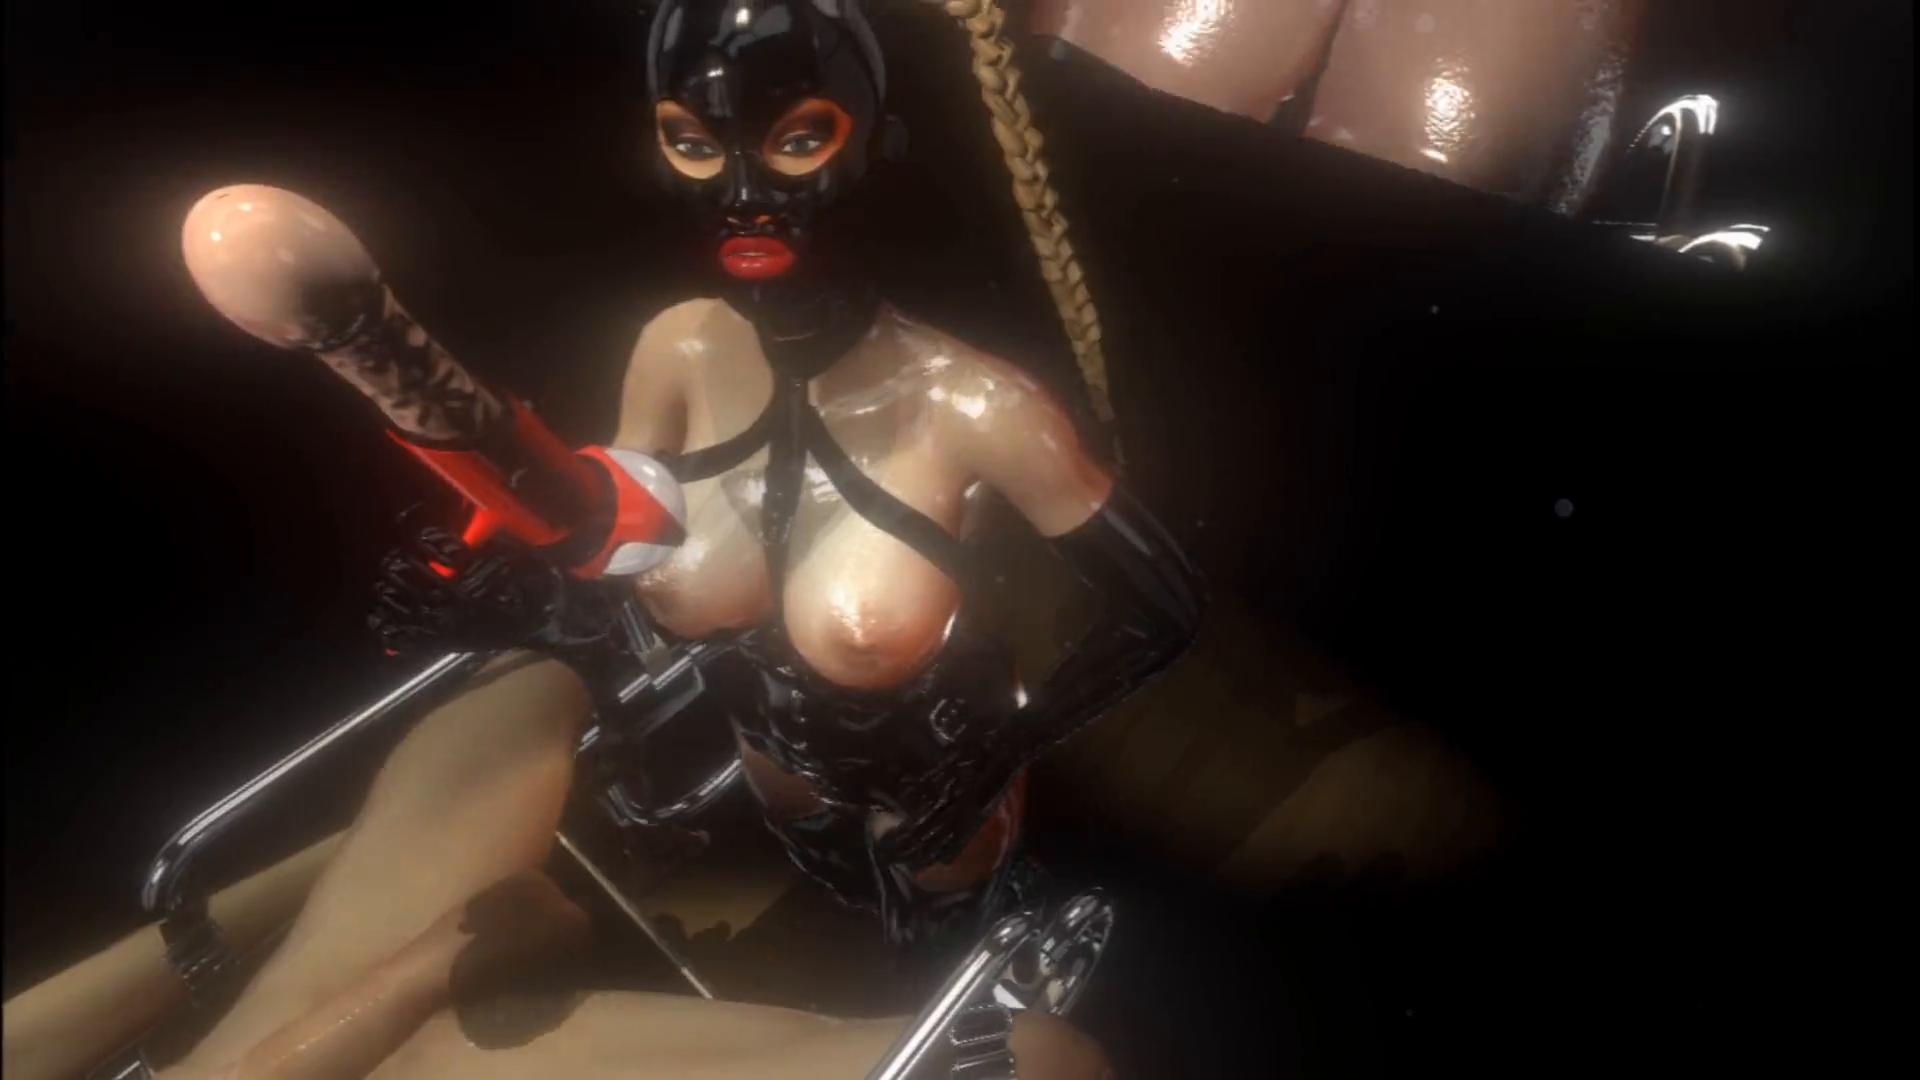 Big tits mistress dildo gun vr sex game